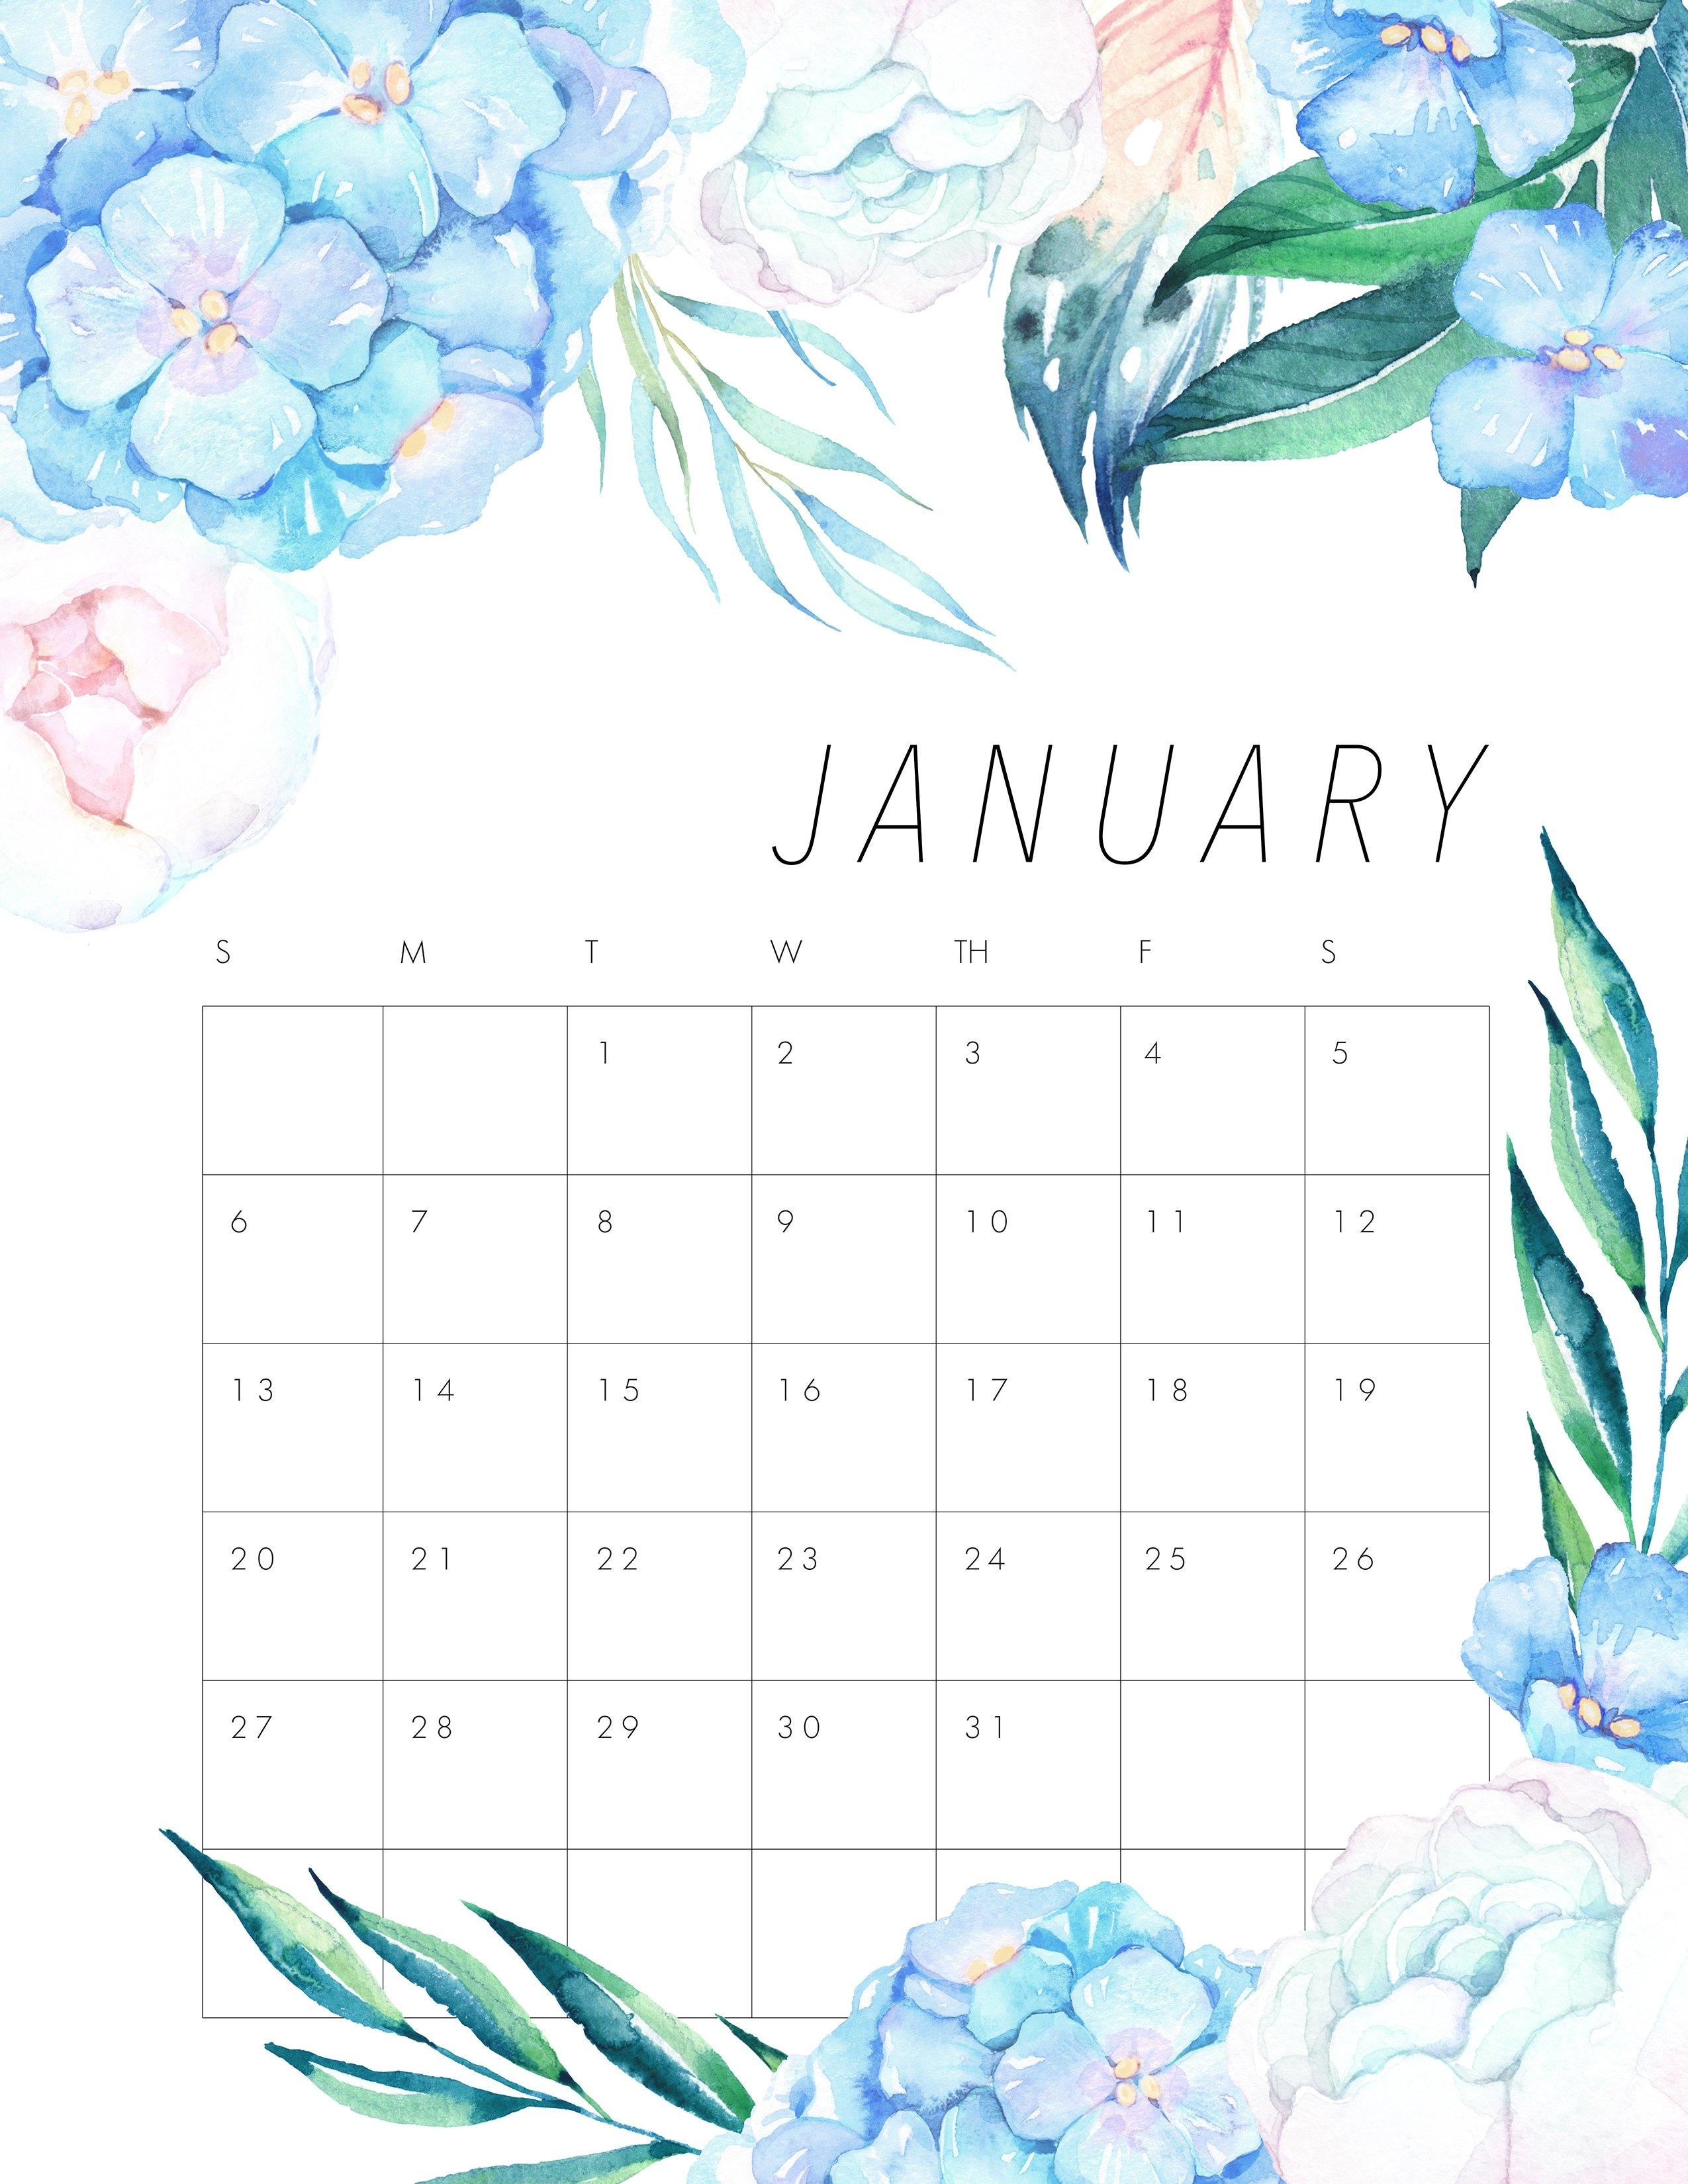 Free Printable 2019 Floral Calendar – The Cottage Market 2019 Calendar 8.5 X 11 Printable